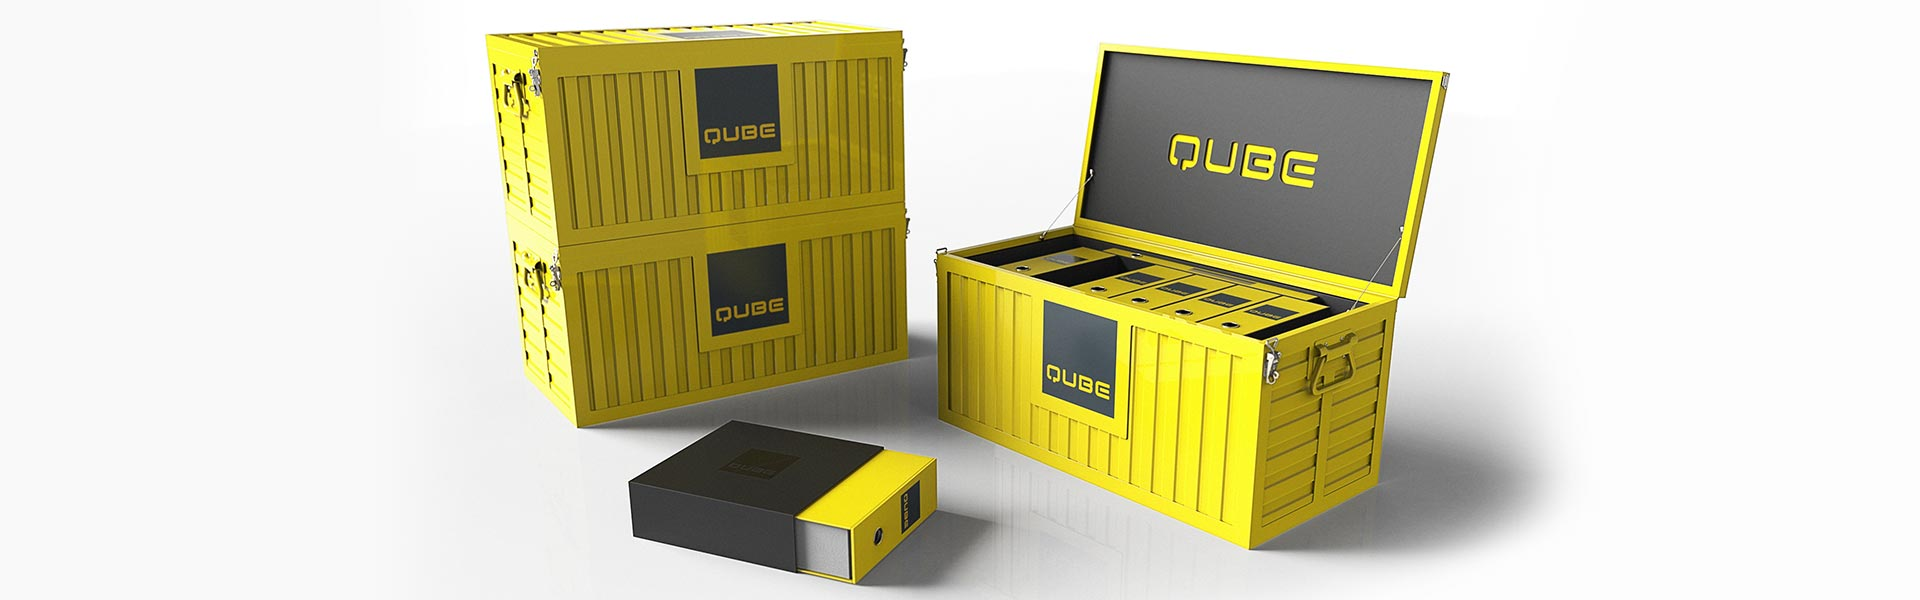 Qube Boxes 01